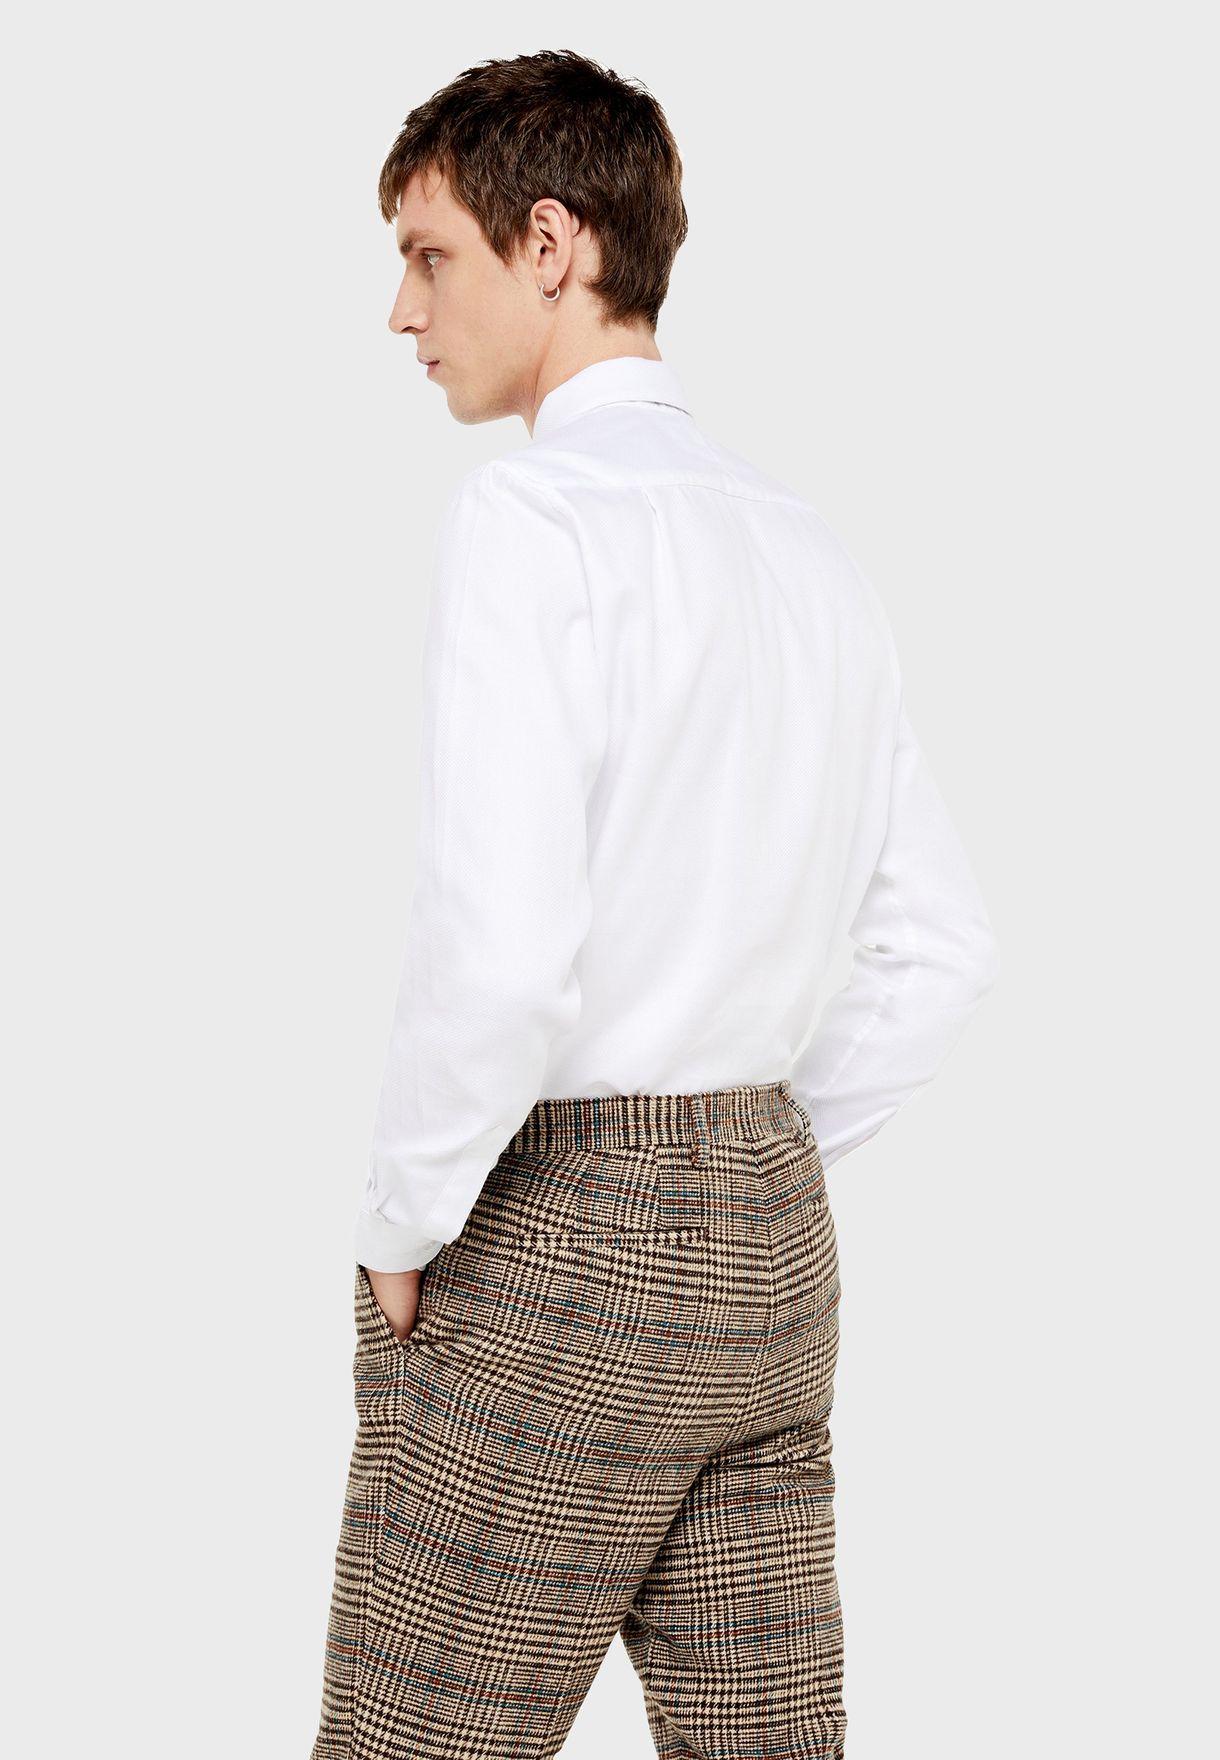 Texture Slim Fit Shirt